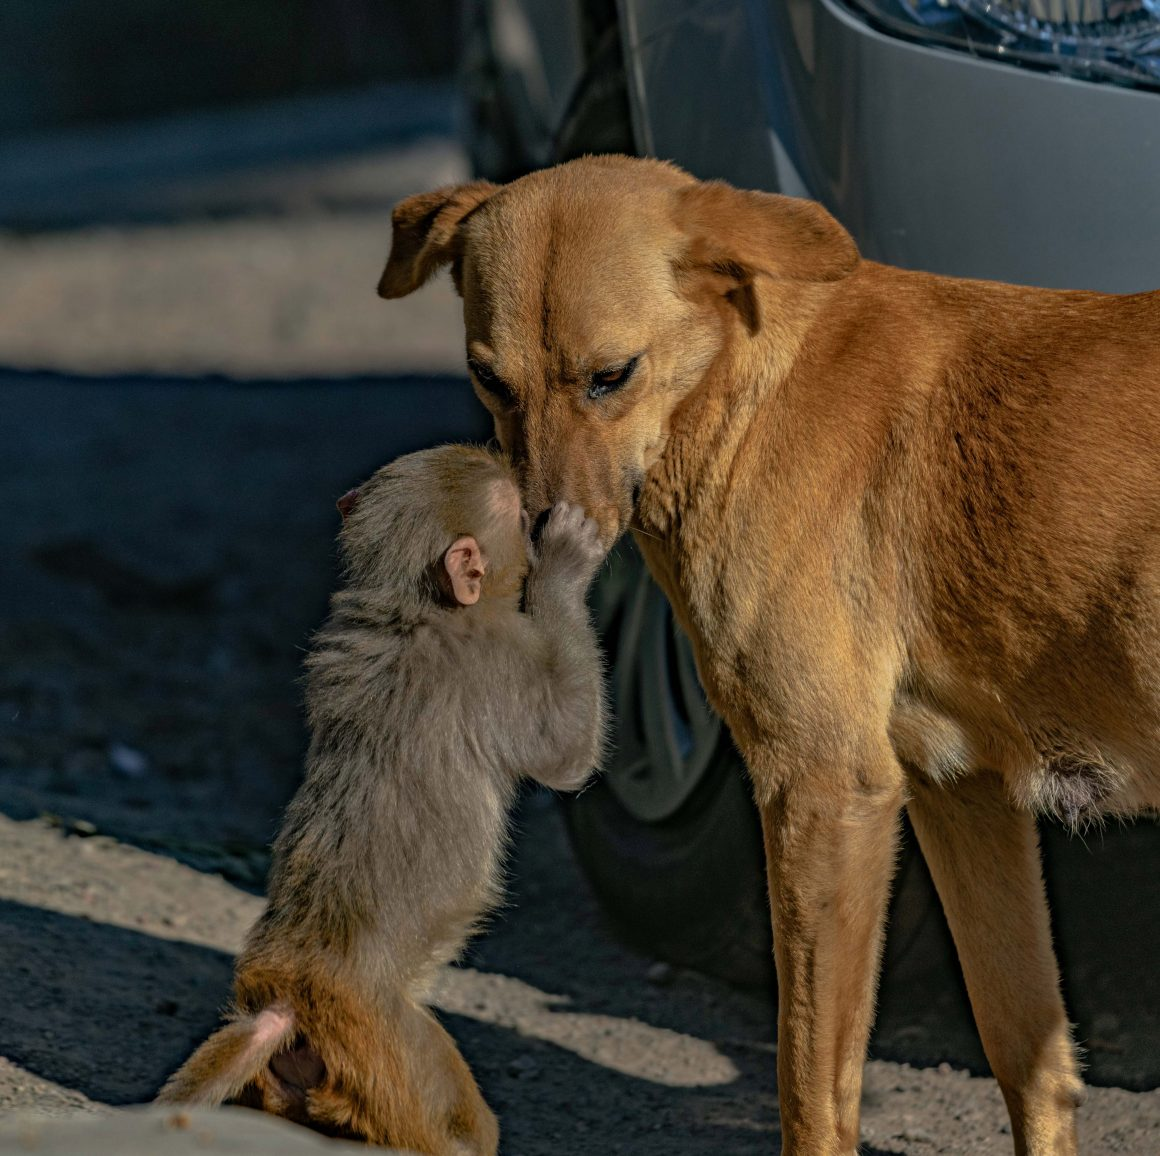 induk anjing mengadopsi bayi monyet